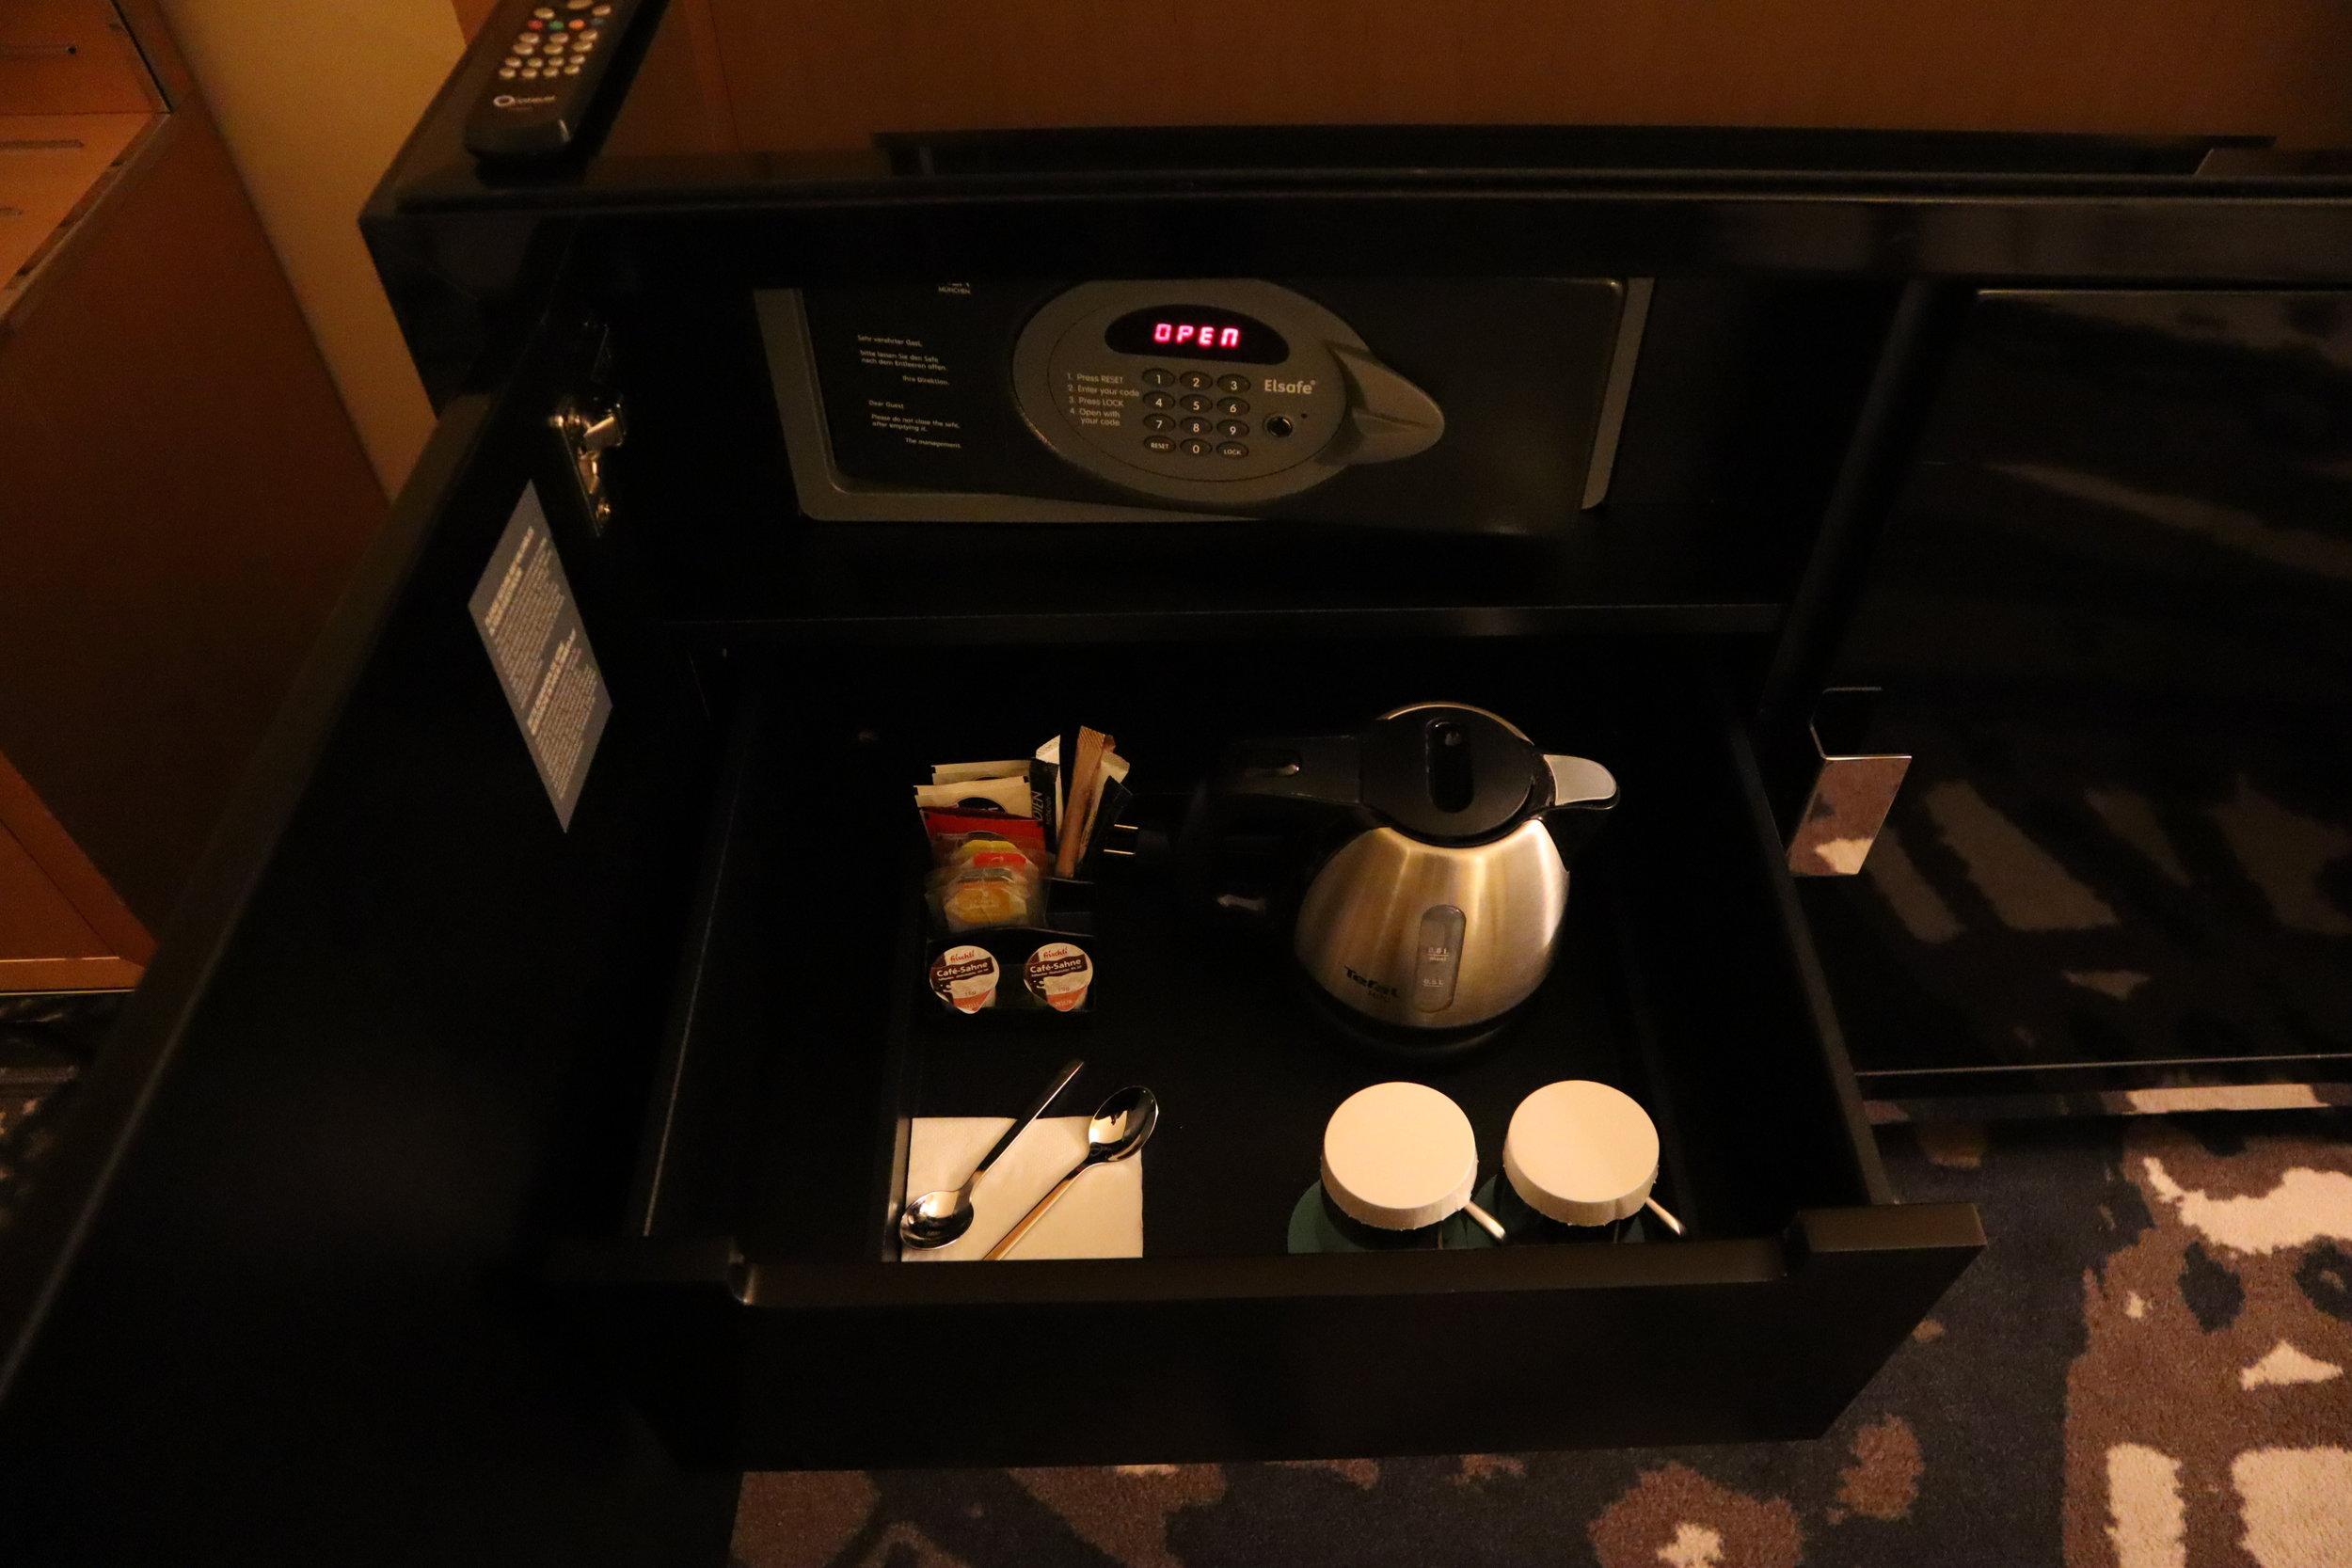 Le Méridien Munich – Minibar and coffee & tea kit